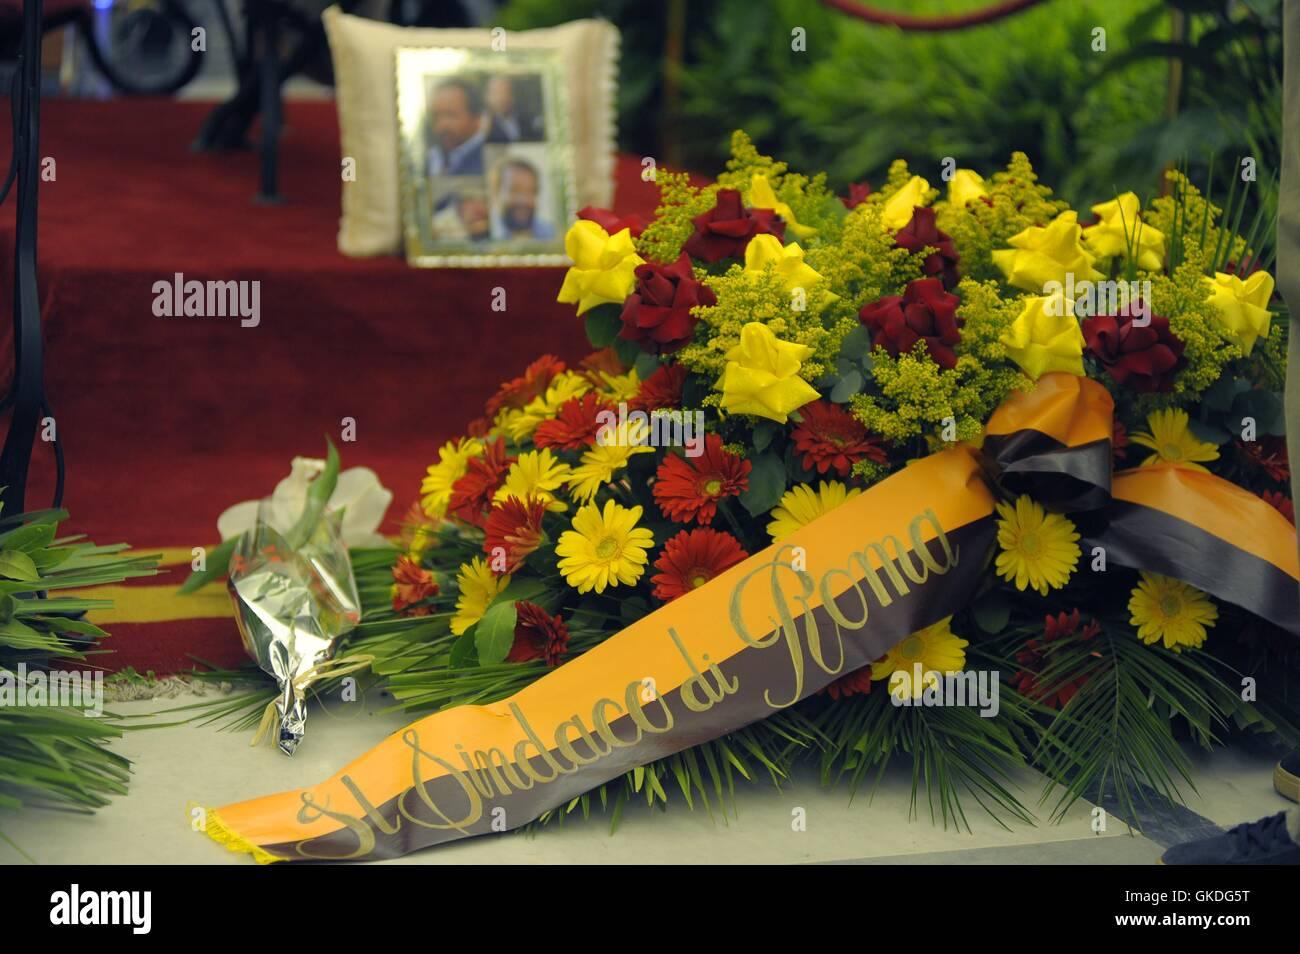 Traditional italian funeral flowers gallery flower wallpaper hd traditional italian funeral flowers image collections flower italian funeral flowers image collections flower wallpaper hd traditional izmirmasajfo